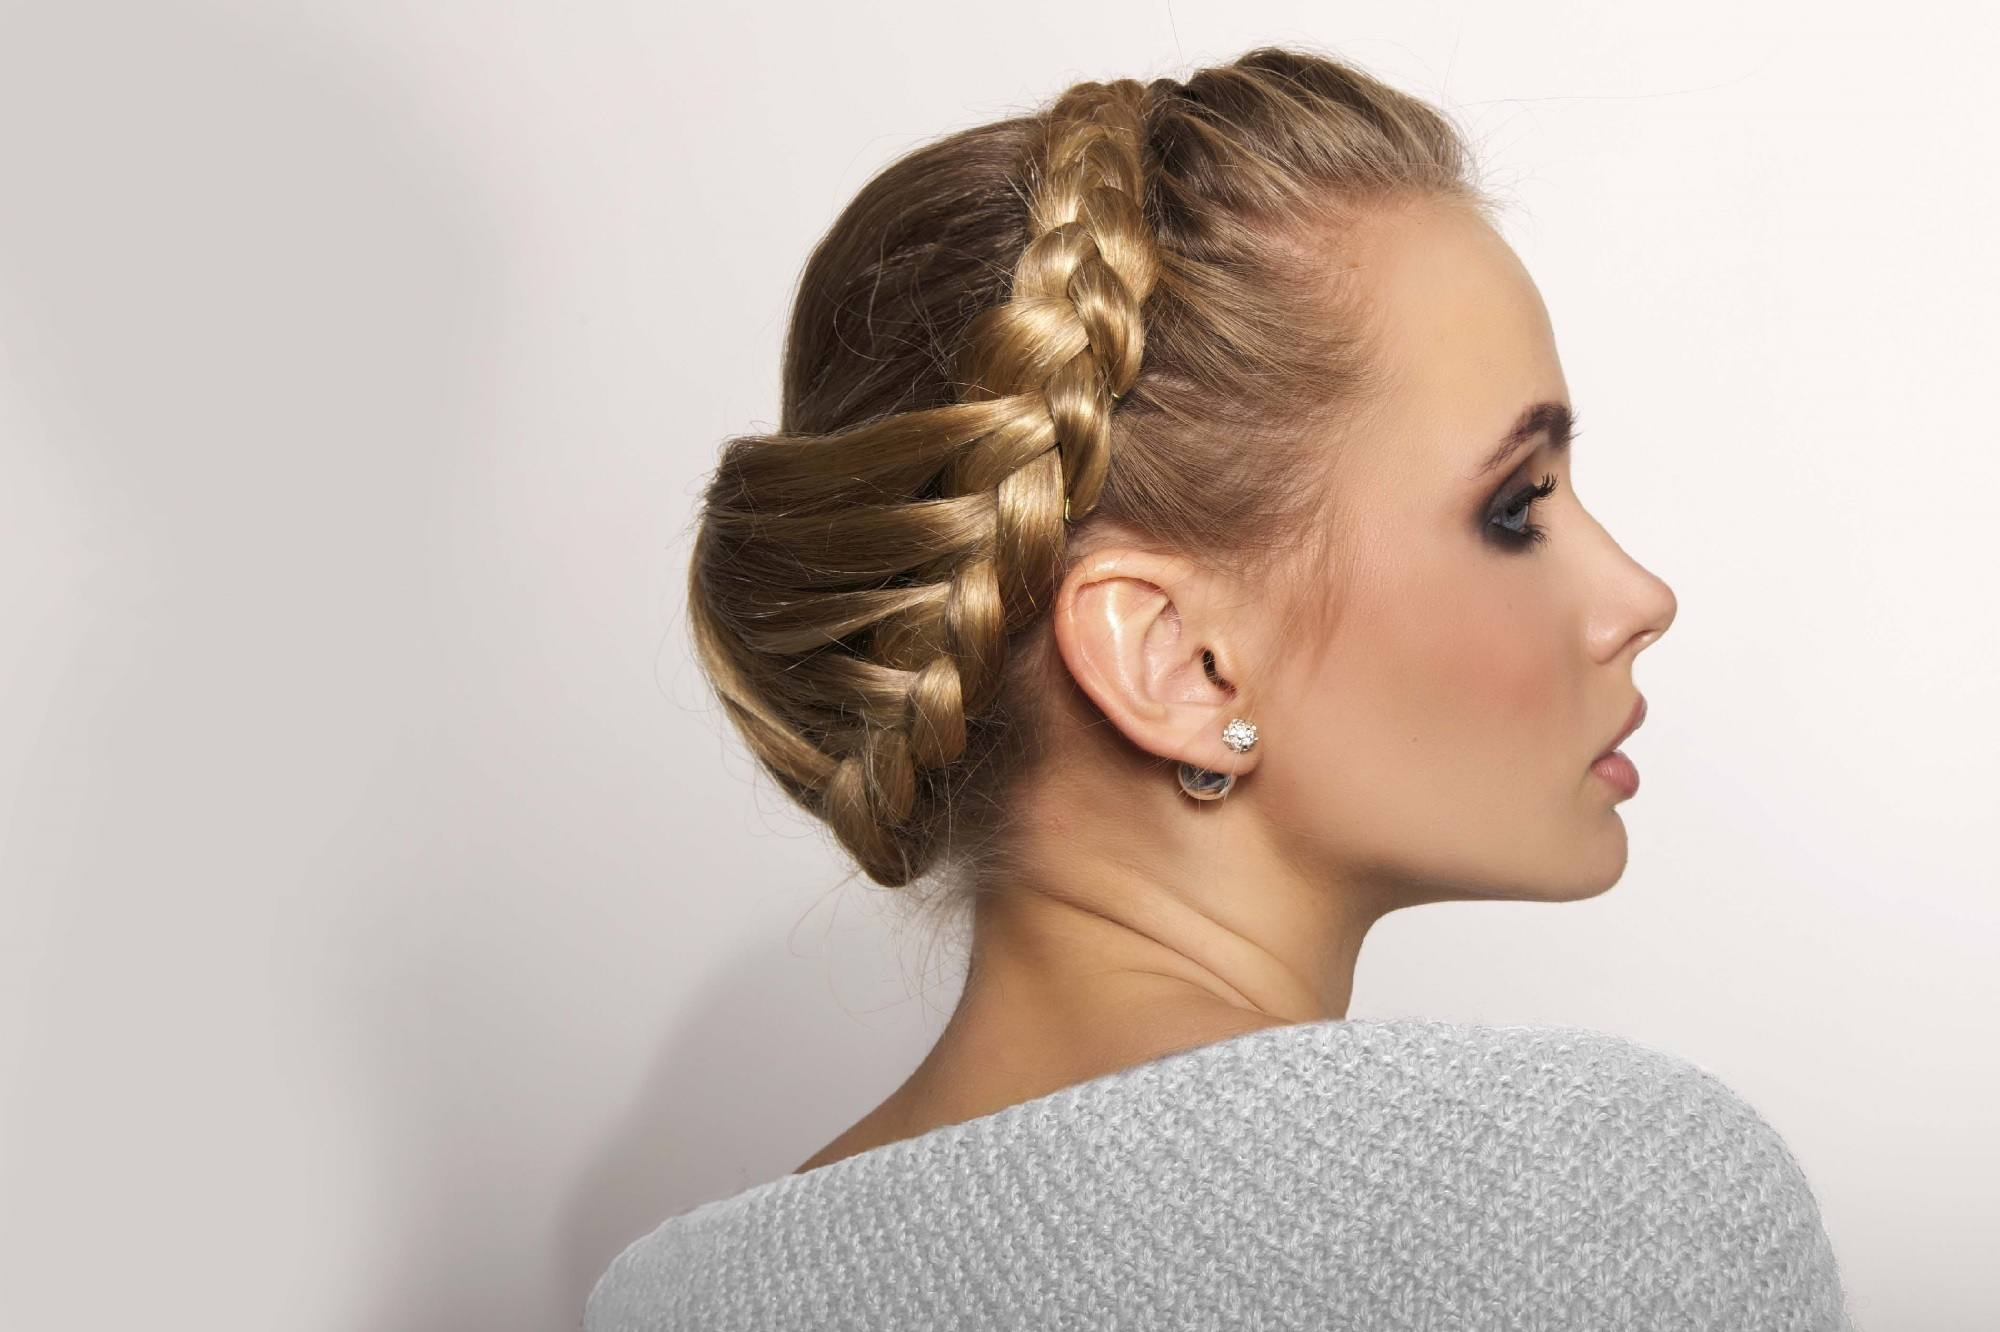 Rainy day hairstyles - Braided updo